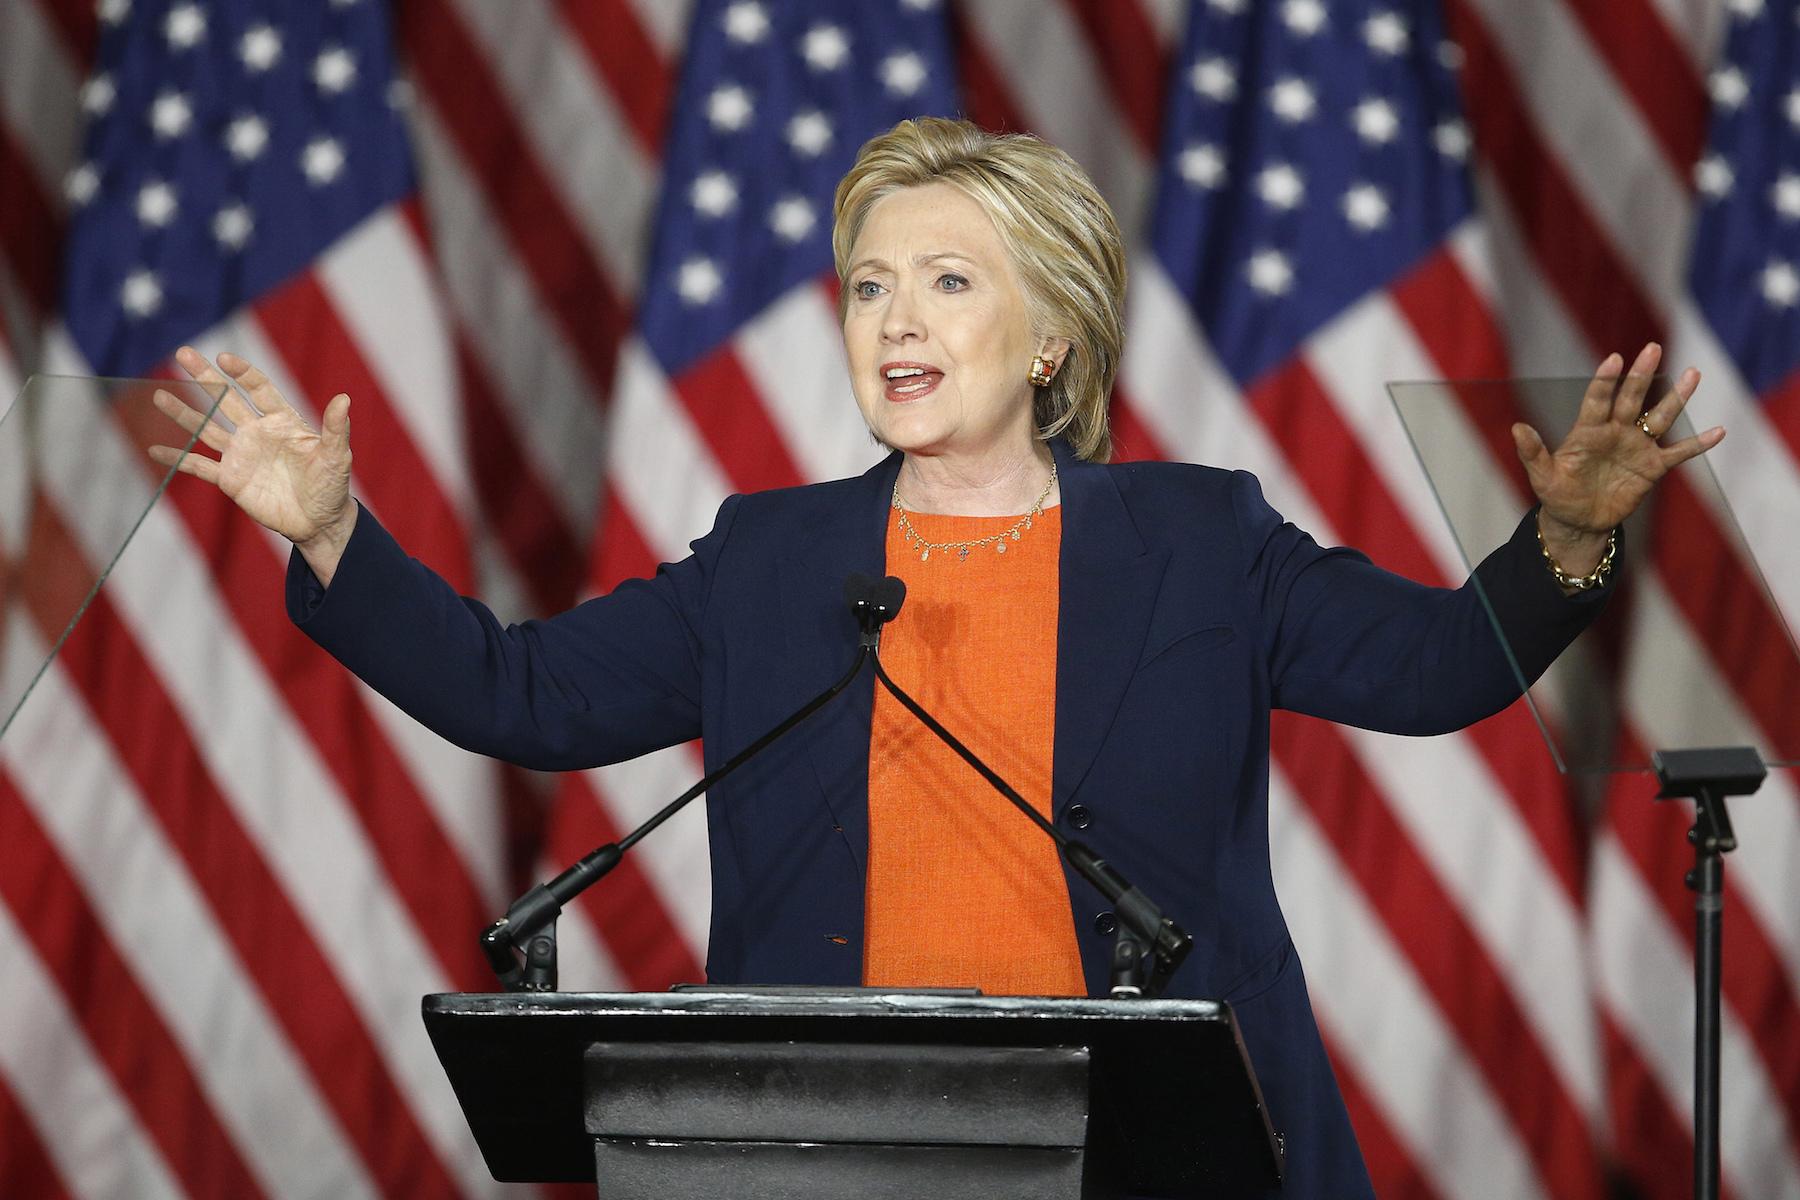 DEM-2016-Clinton_Comm-27.jpg